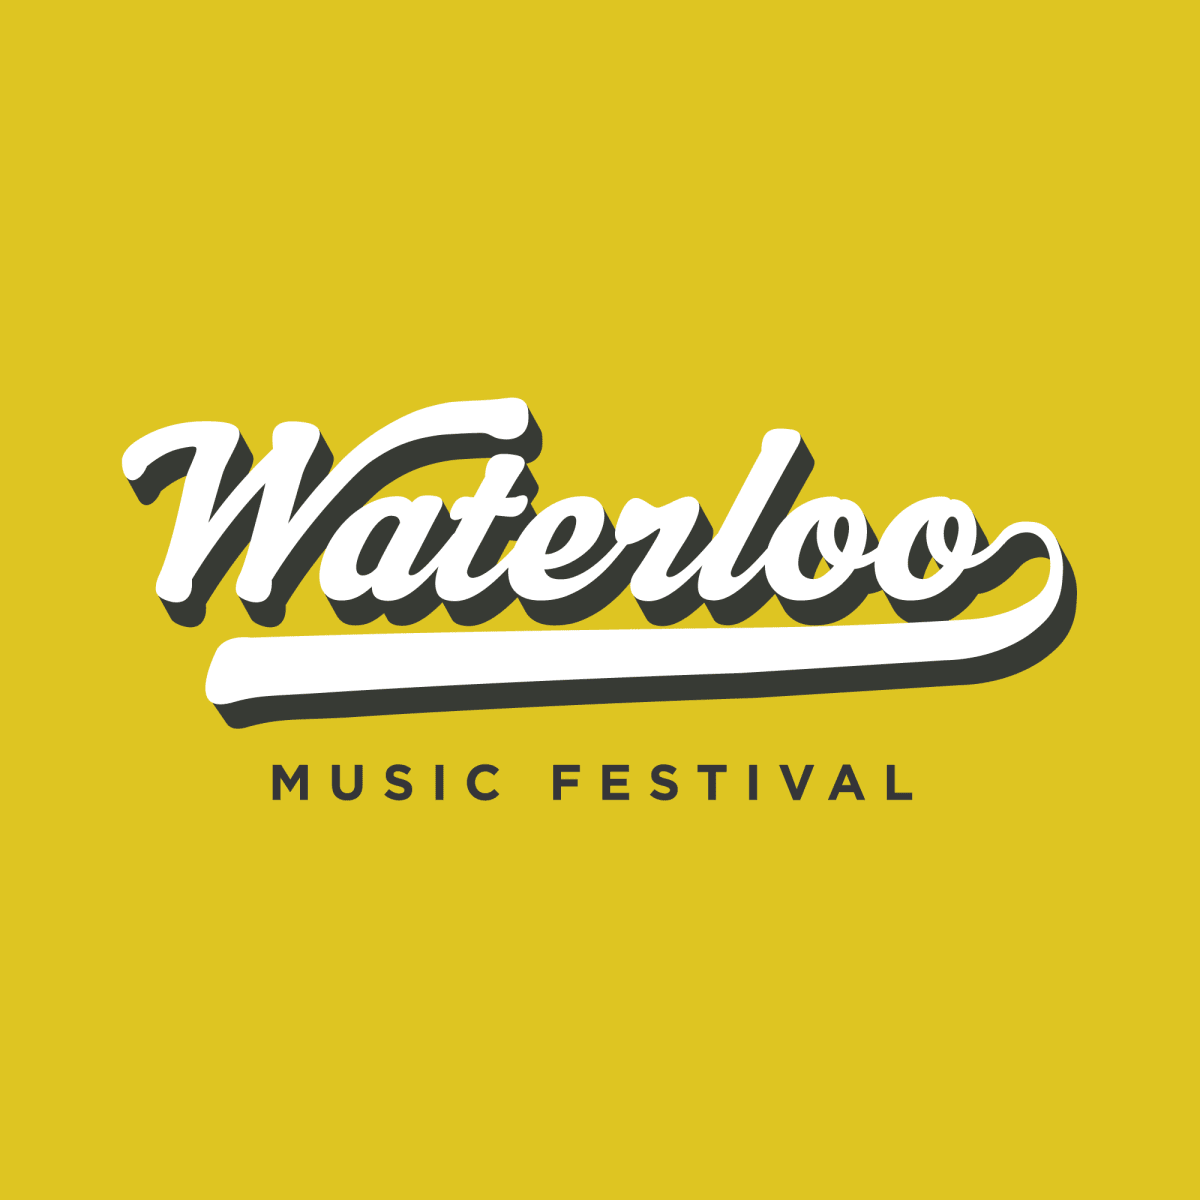 Waterloo Music Festival logo